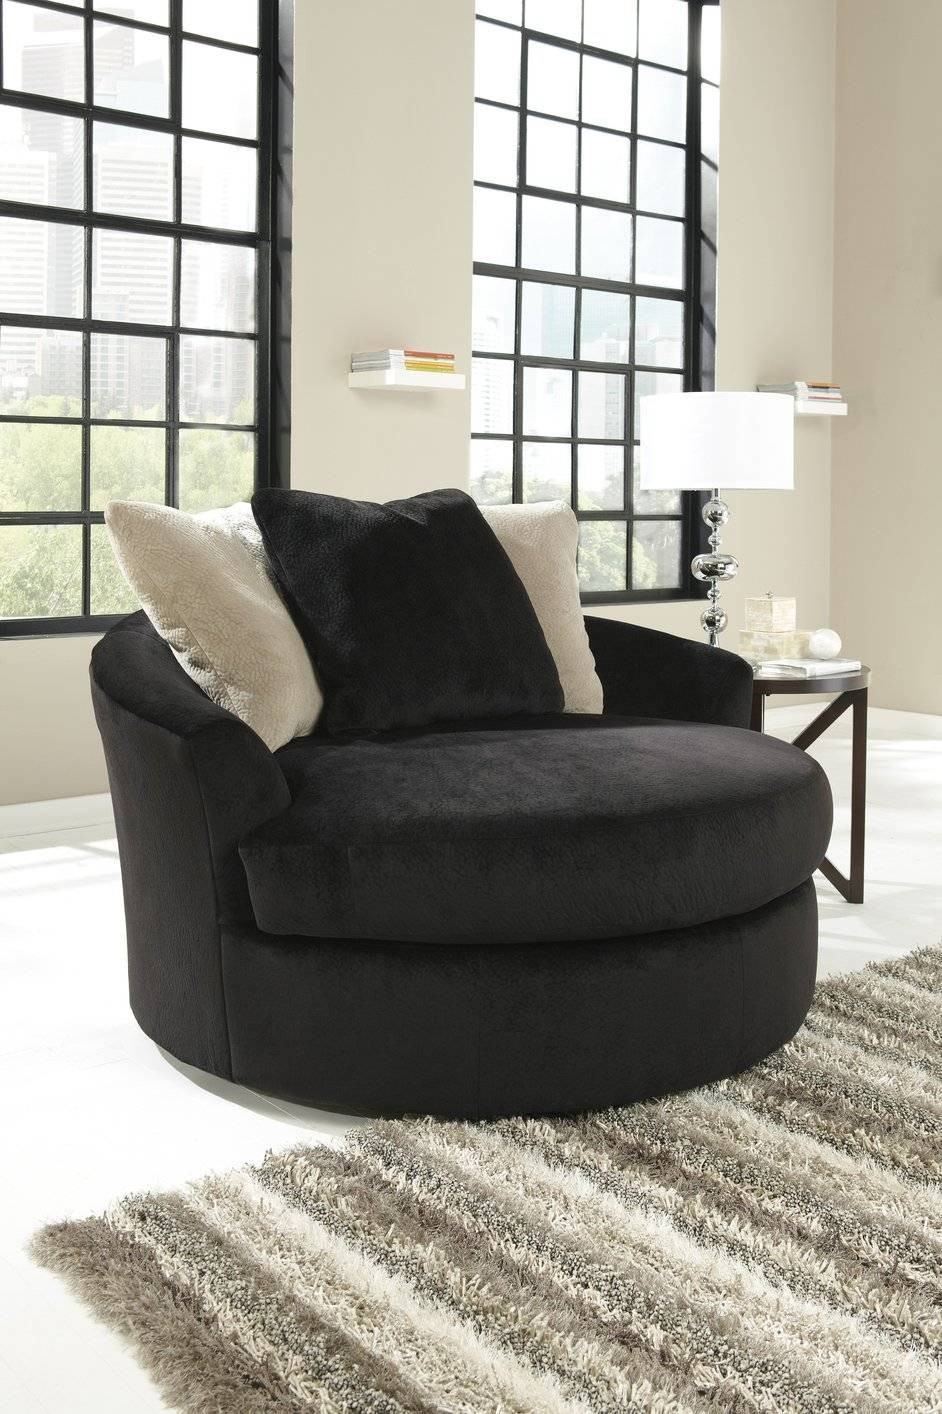 Rio Corner Sofa Groupon Goods Swivel Sofa Chair ~ Hmmi regarding Round Swivel Sofa Chairs (Image 13 of 30)